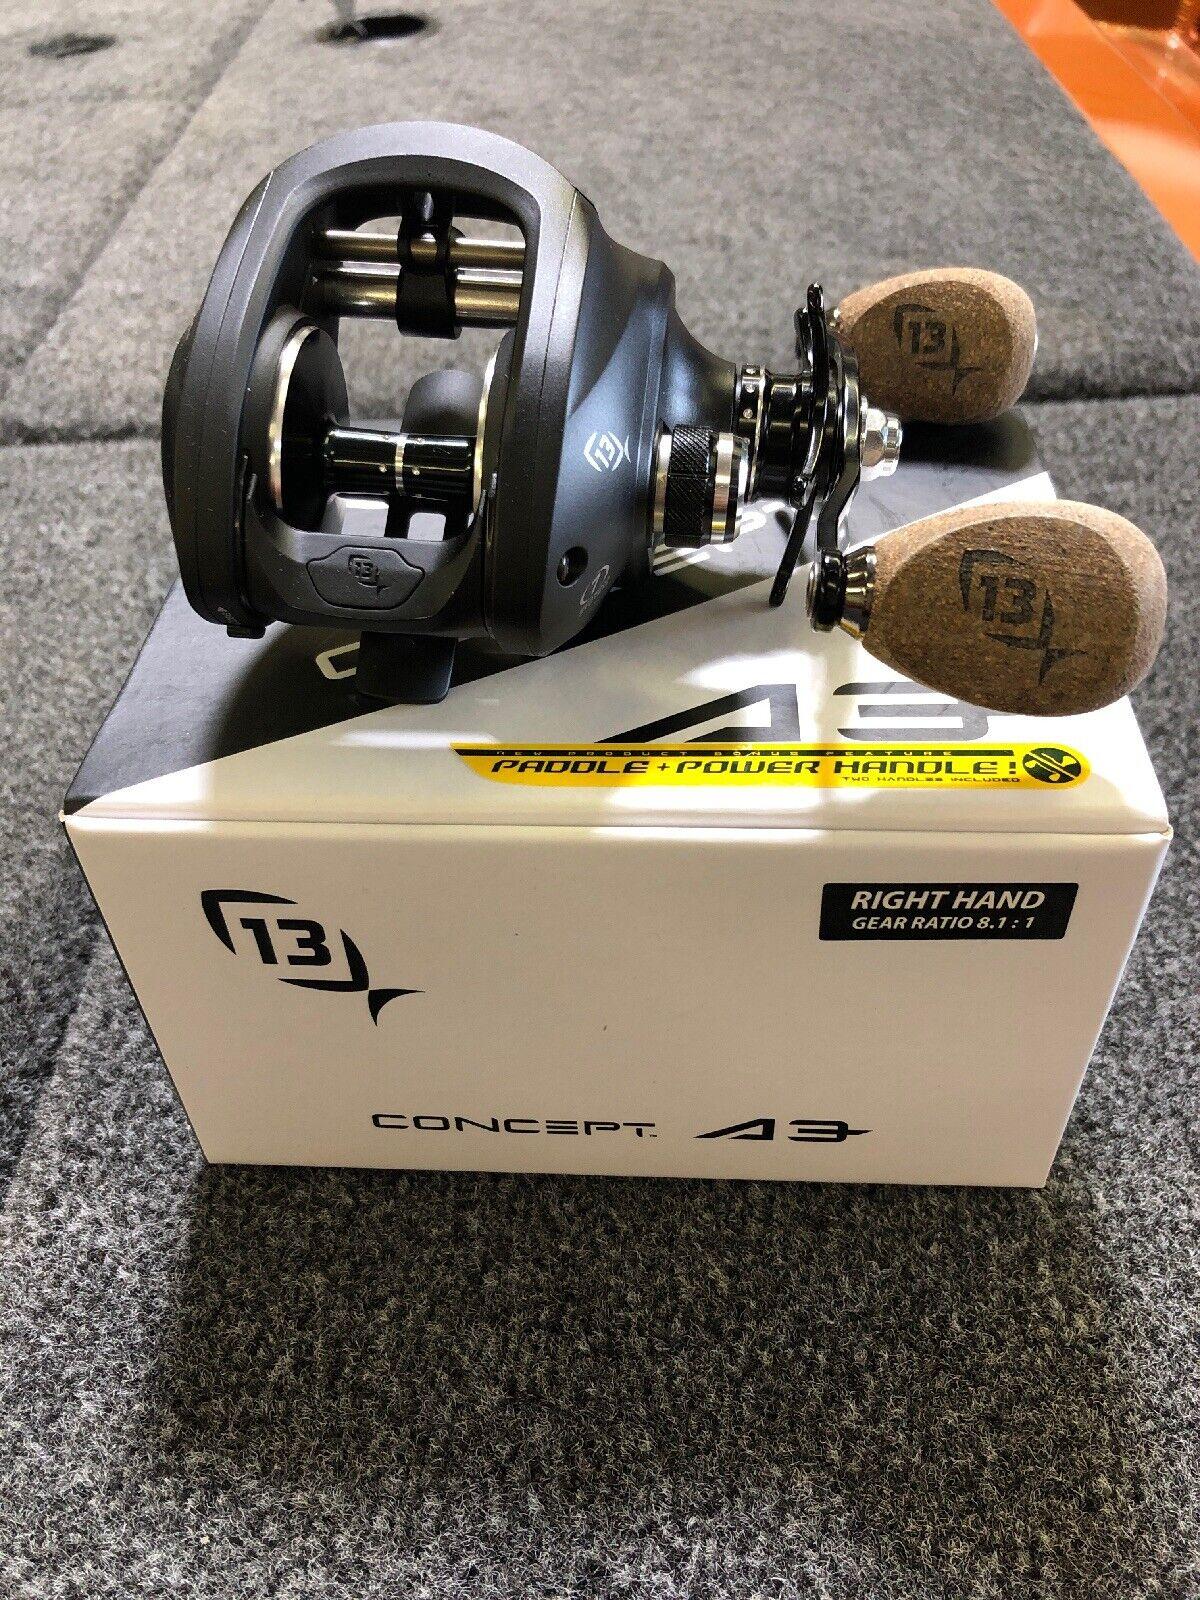 13 Fishing Concept A3 RH 8.1.1